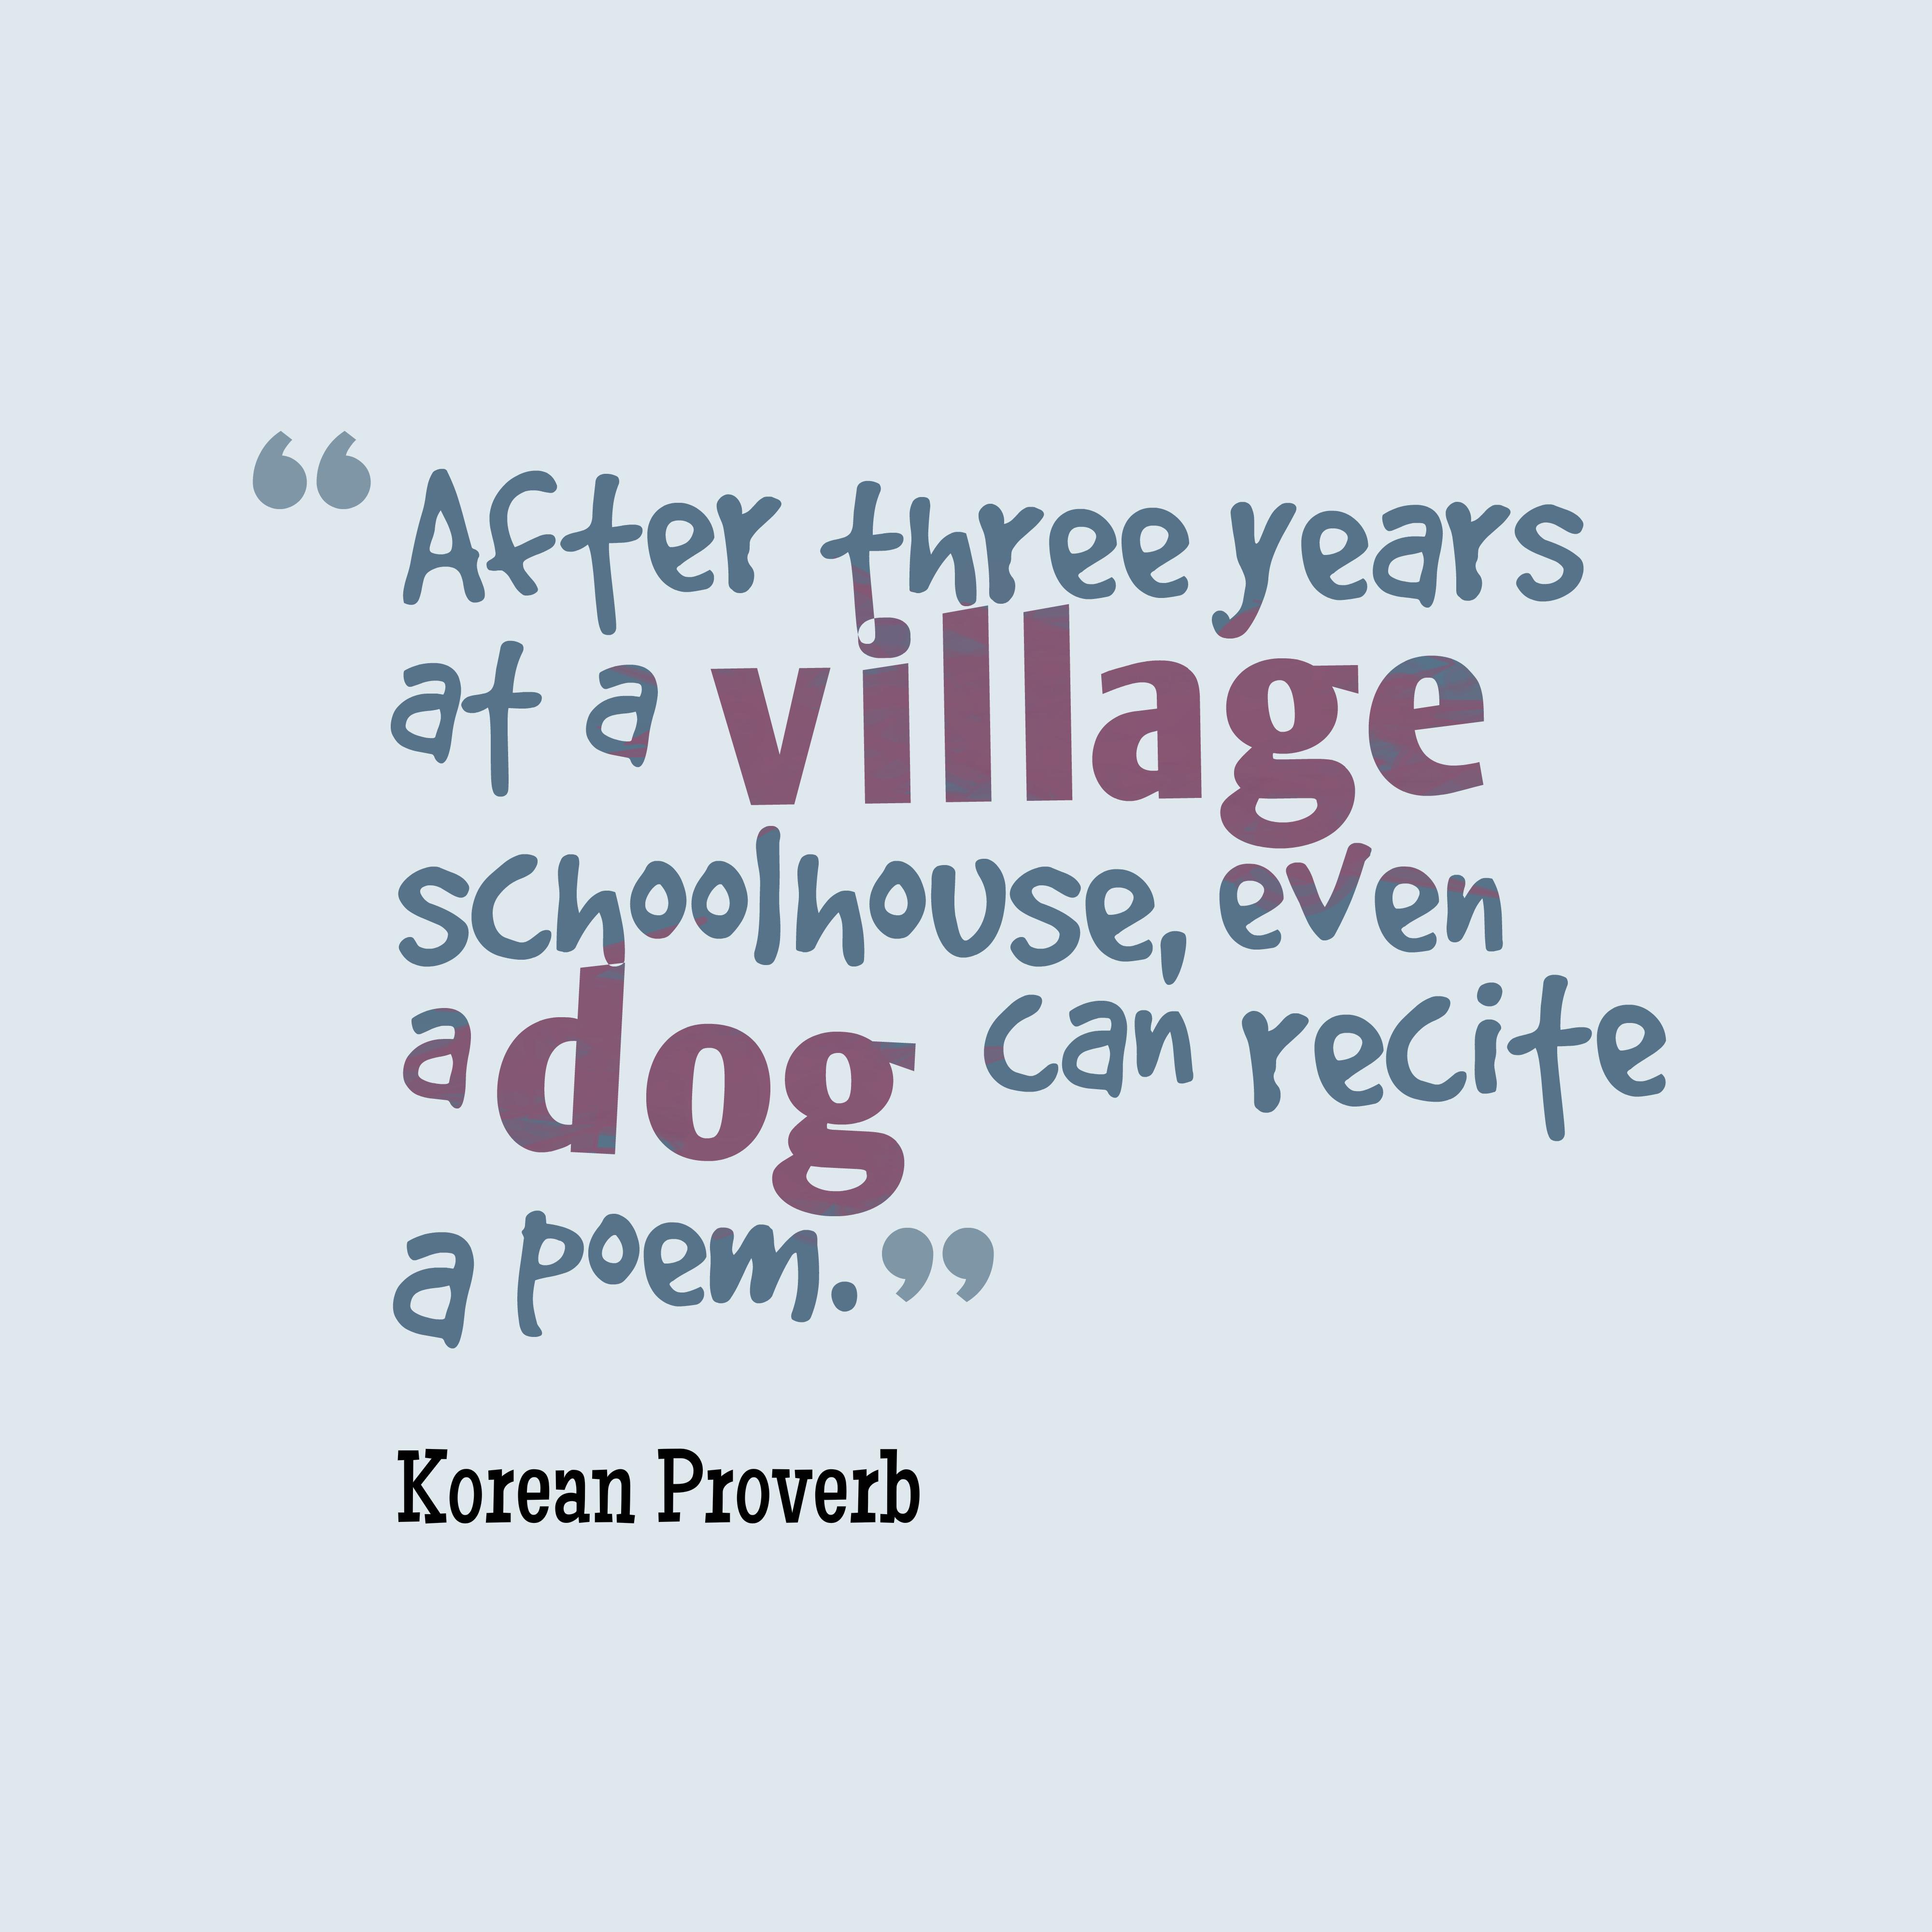 Korean Wisdom About Practice